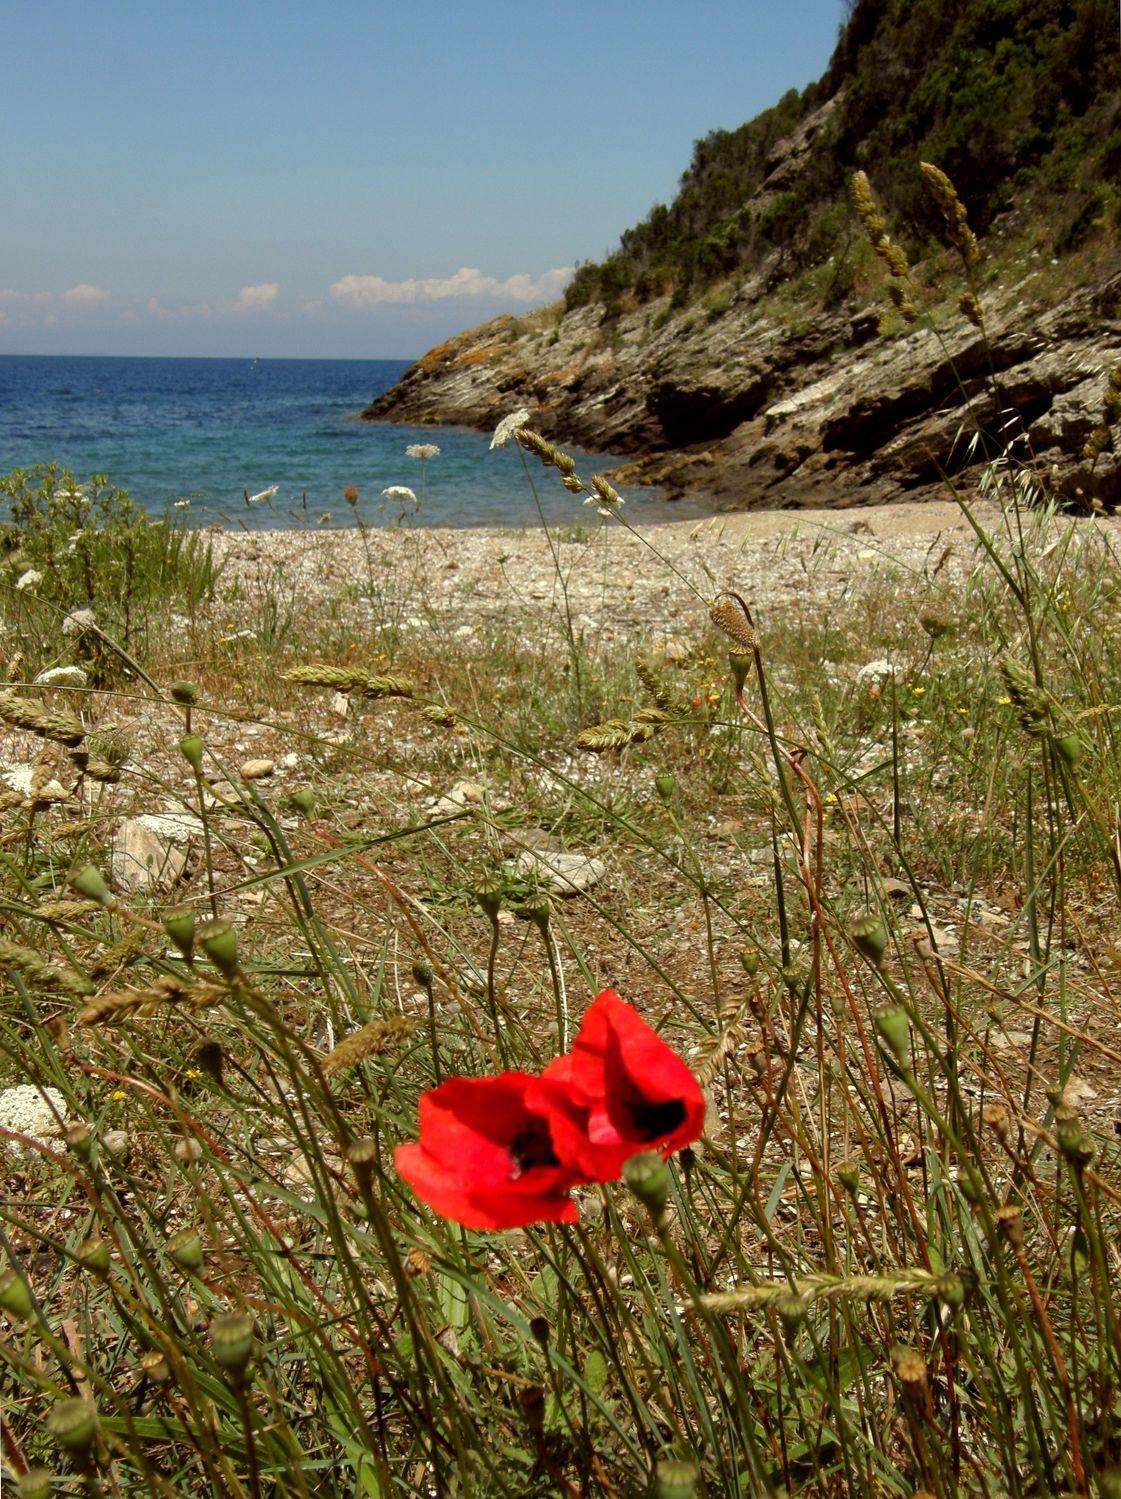 Bild mit Mohn, Meerblick, Mohnblume, Sehnsucht nach Meer, Mohnblumen